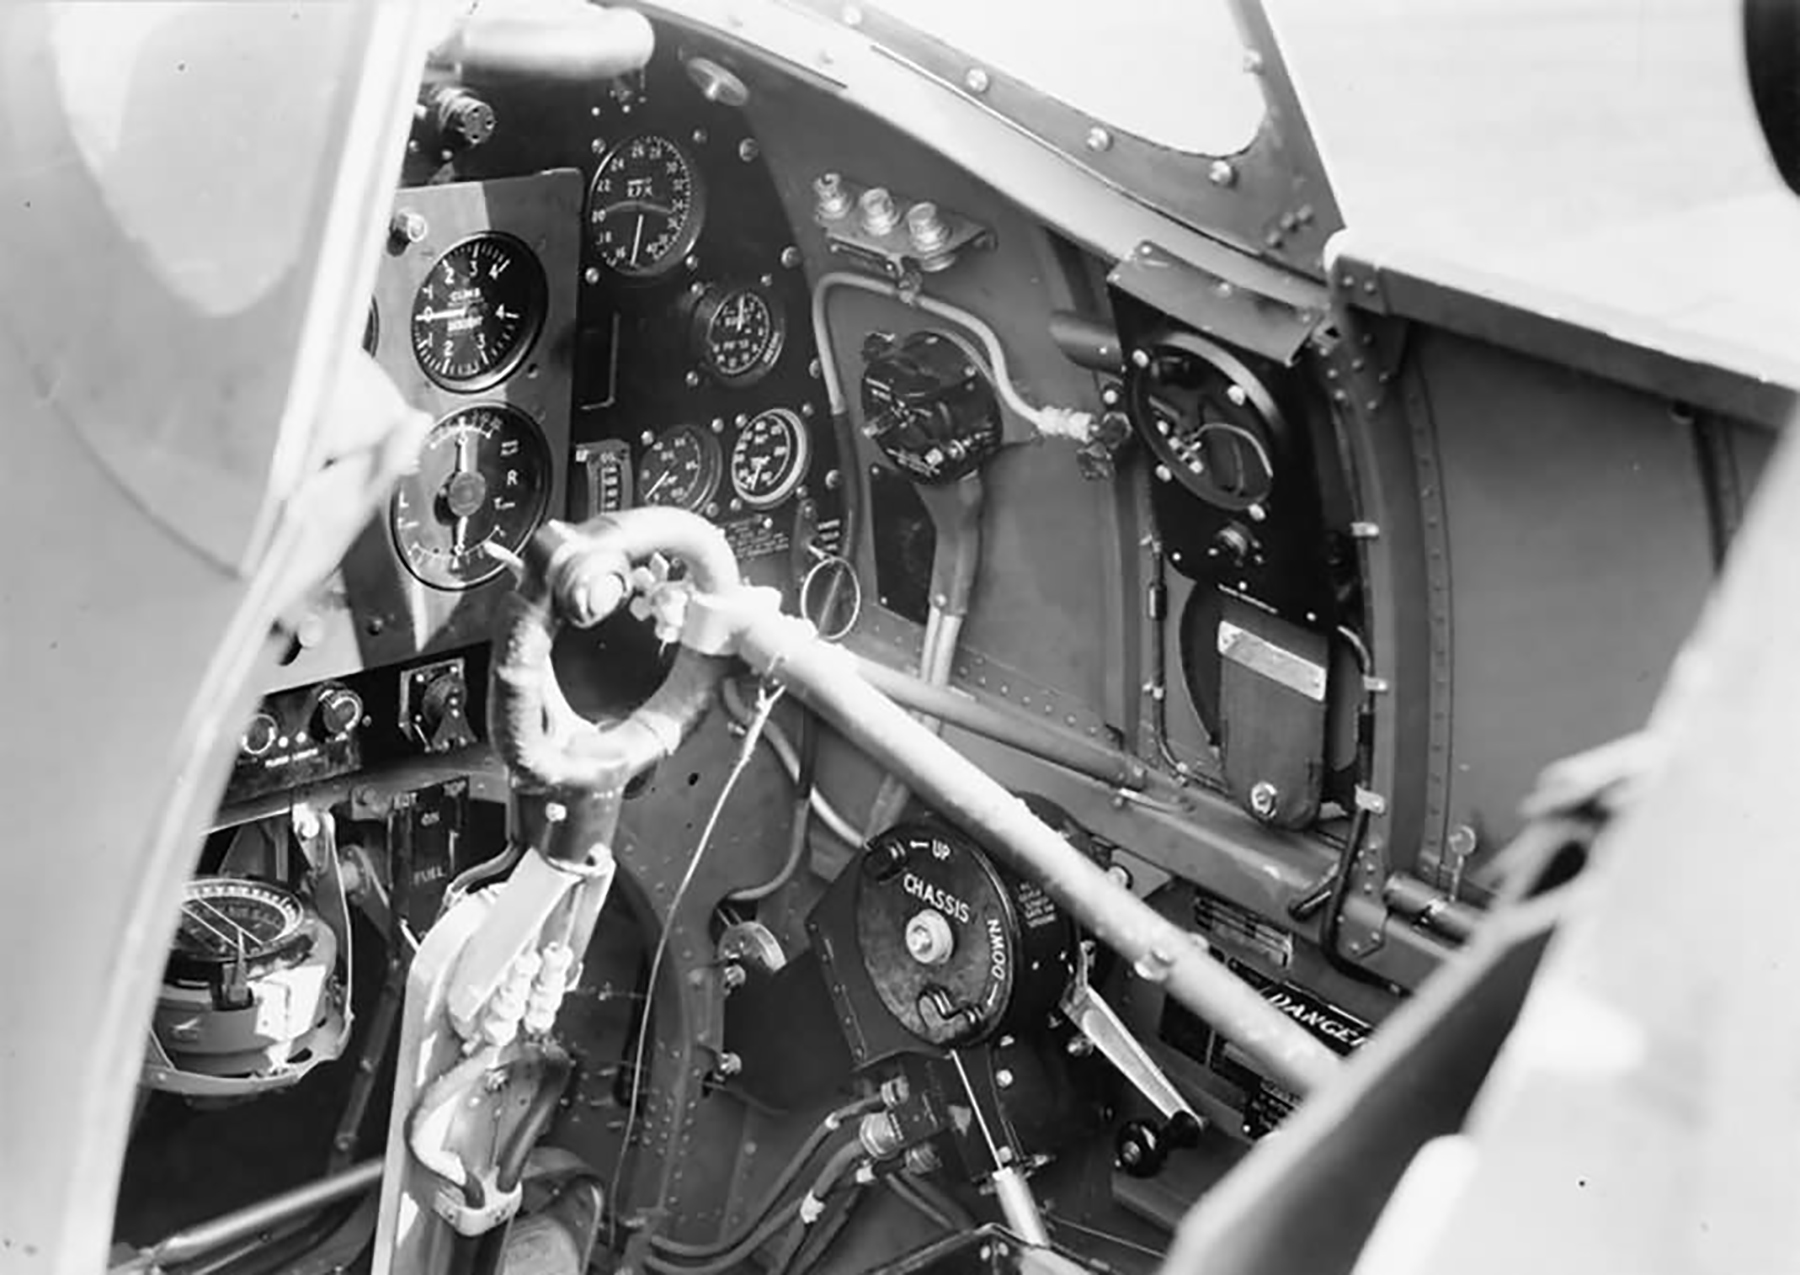 Factory fresh Spitfire Mk IIa cockpit England 1941 web 02